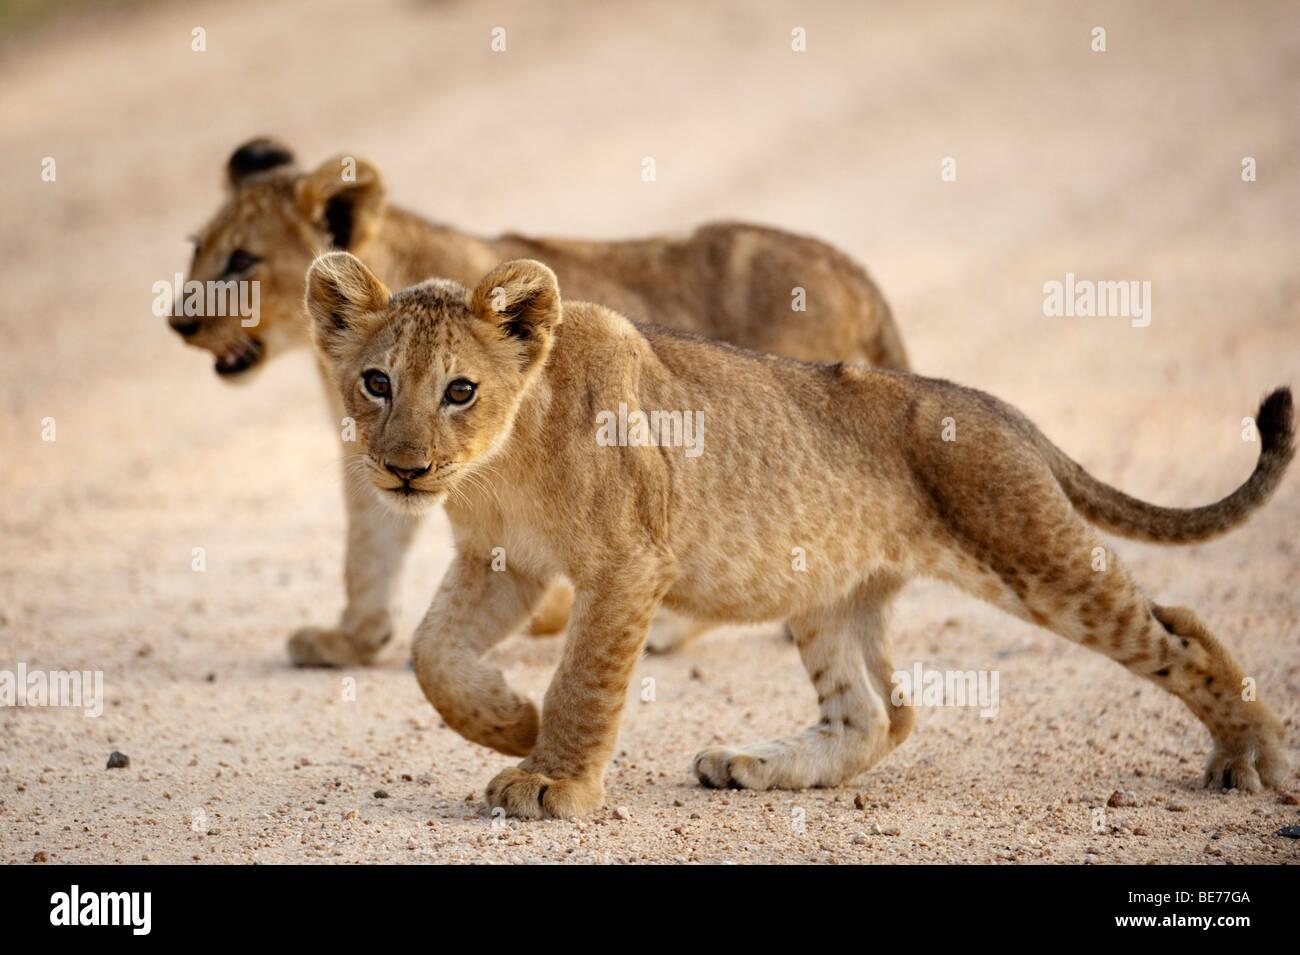 Lion cub (Panthero leo), Kruger National Park, South Africa Stock Photo